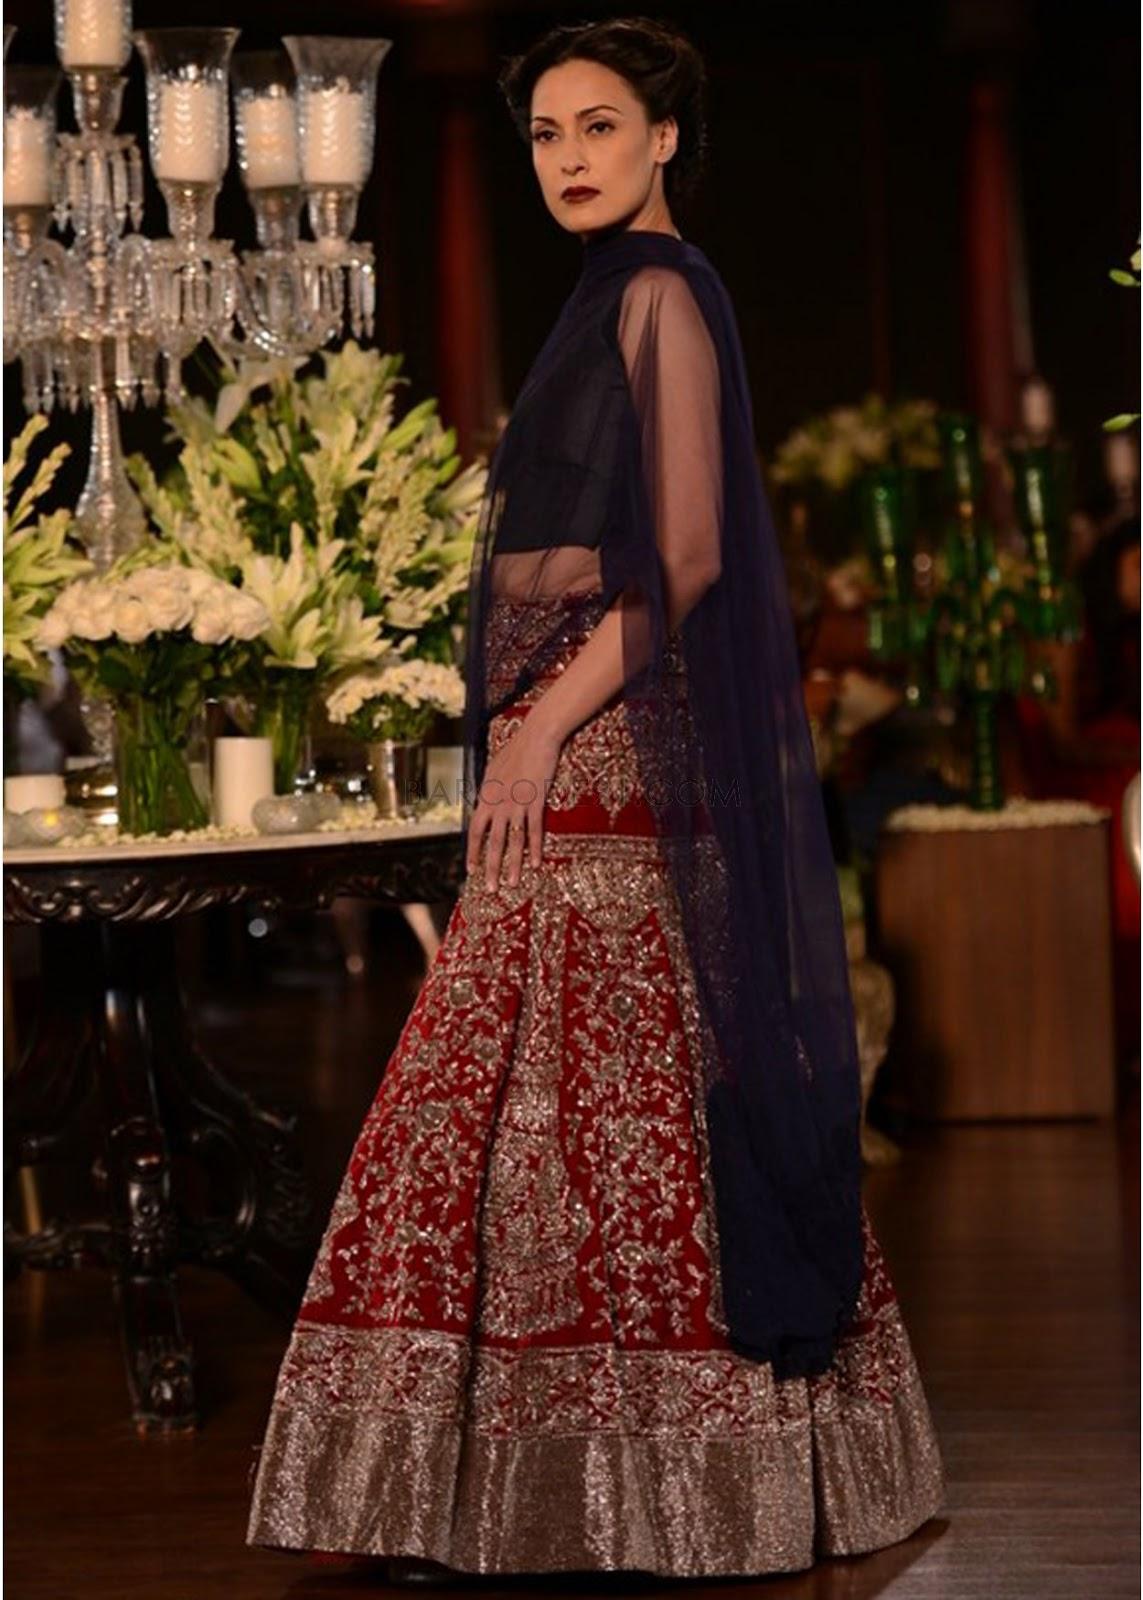 manish malhotra lehenga collection bridal designer ethnic delhi pcj couture week heavy inspired bythe silhouettes dress anarkali makeupandbeauty unknown posted